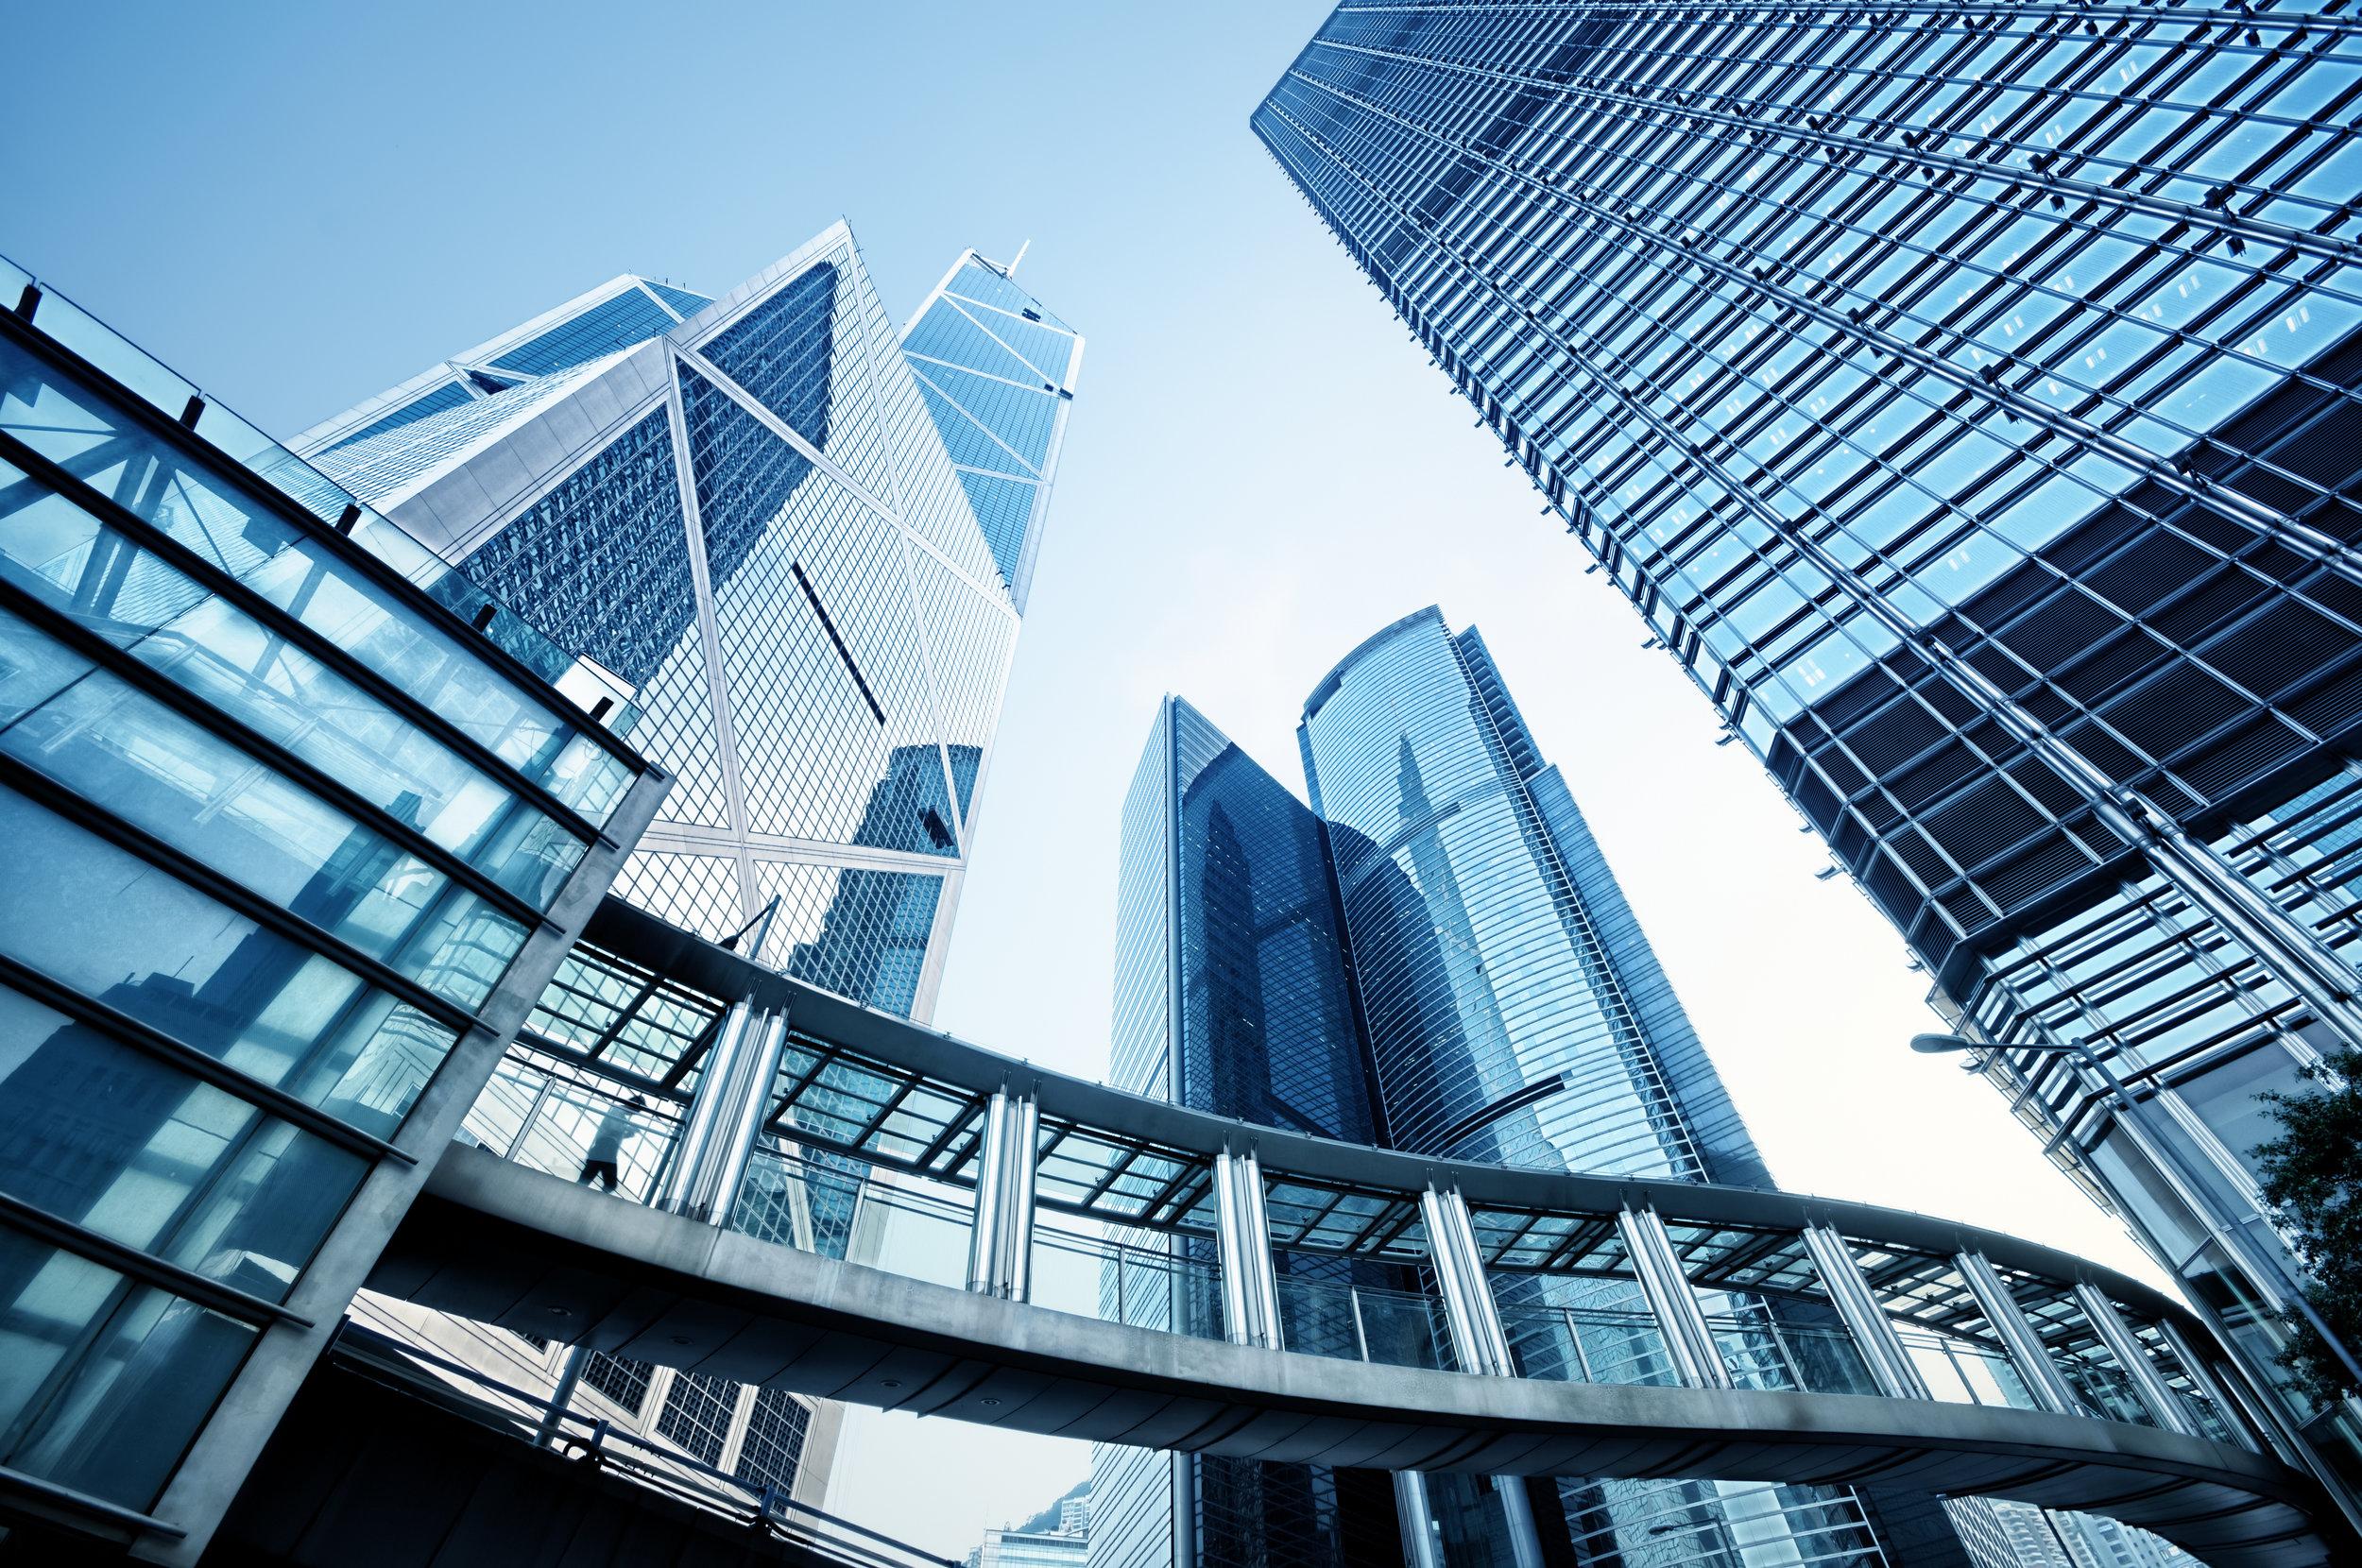 Property Manager - Analyze tenant feedback using data-driven analysis